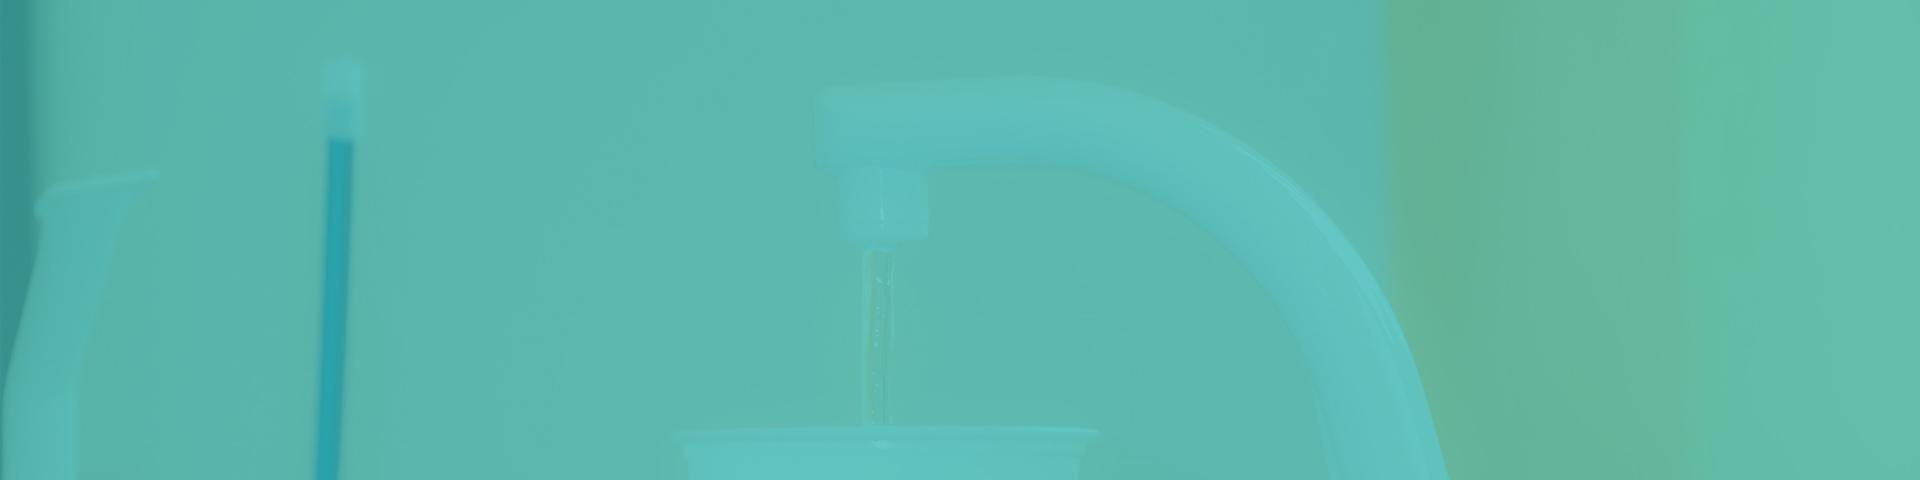 Zahnarztpraxis Graben - Kontakt